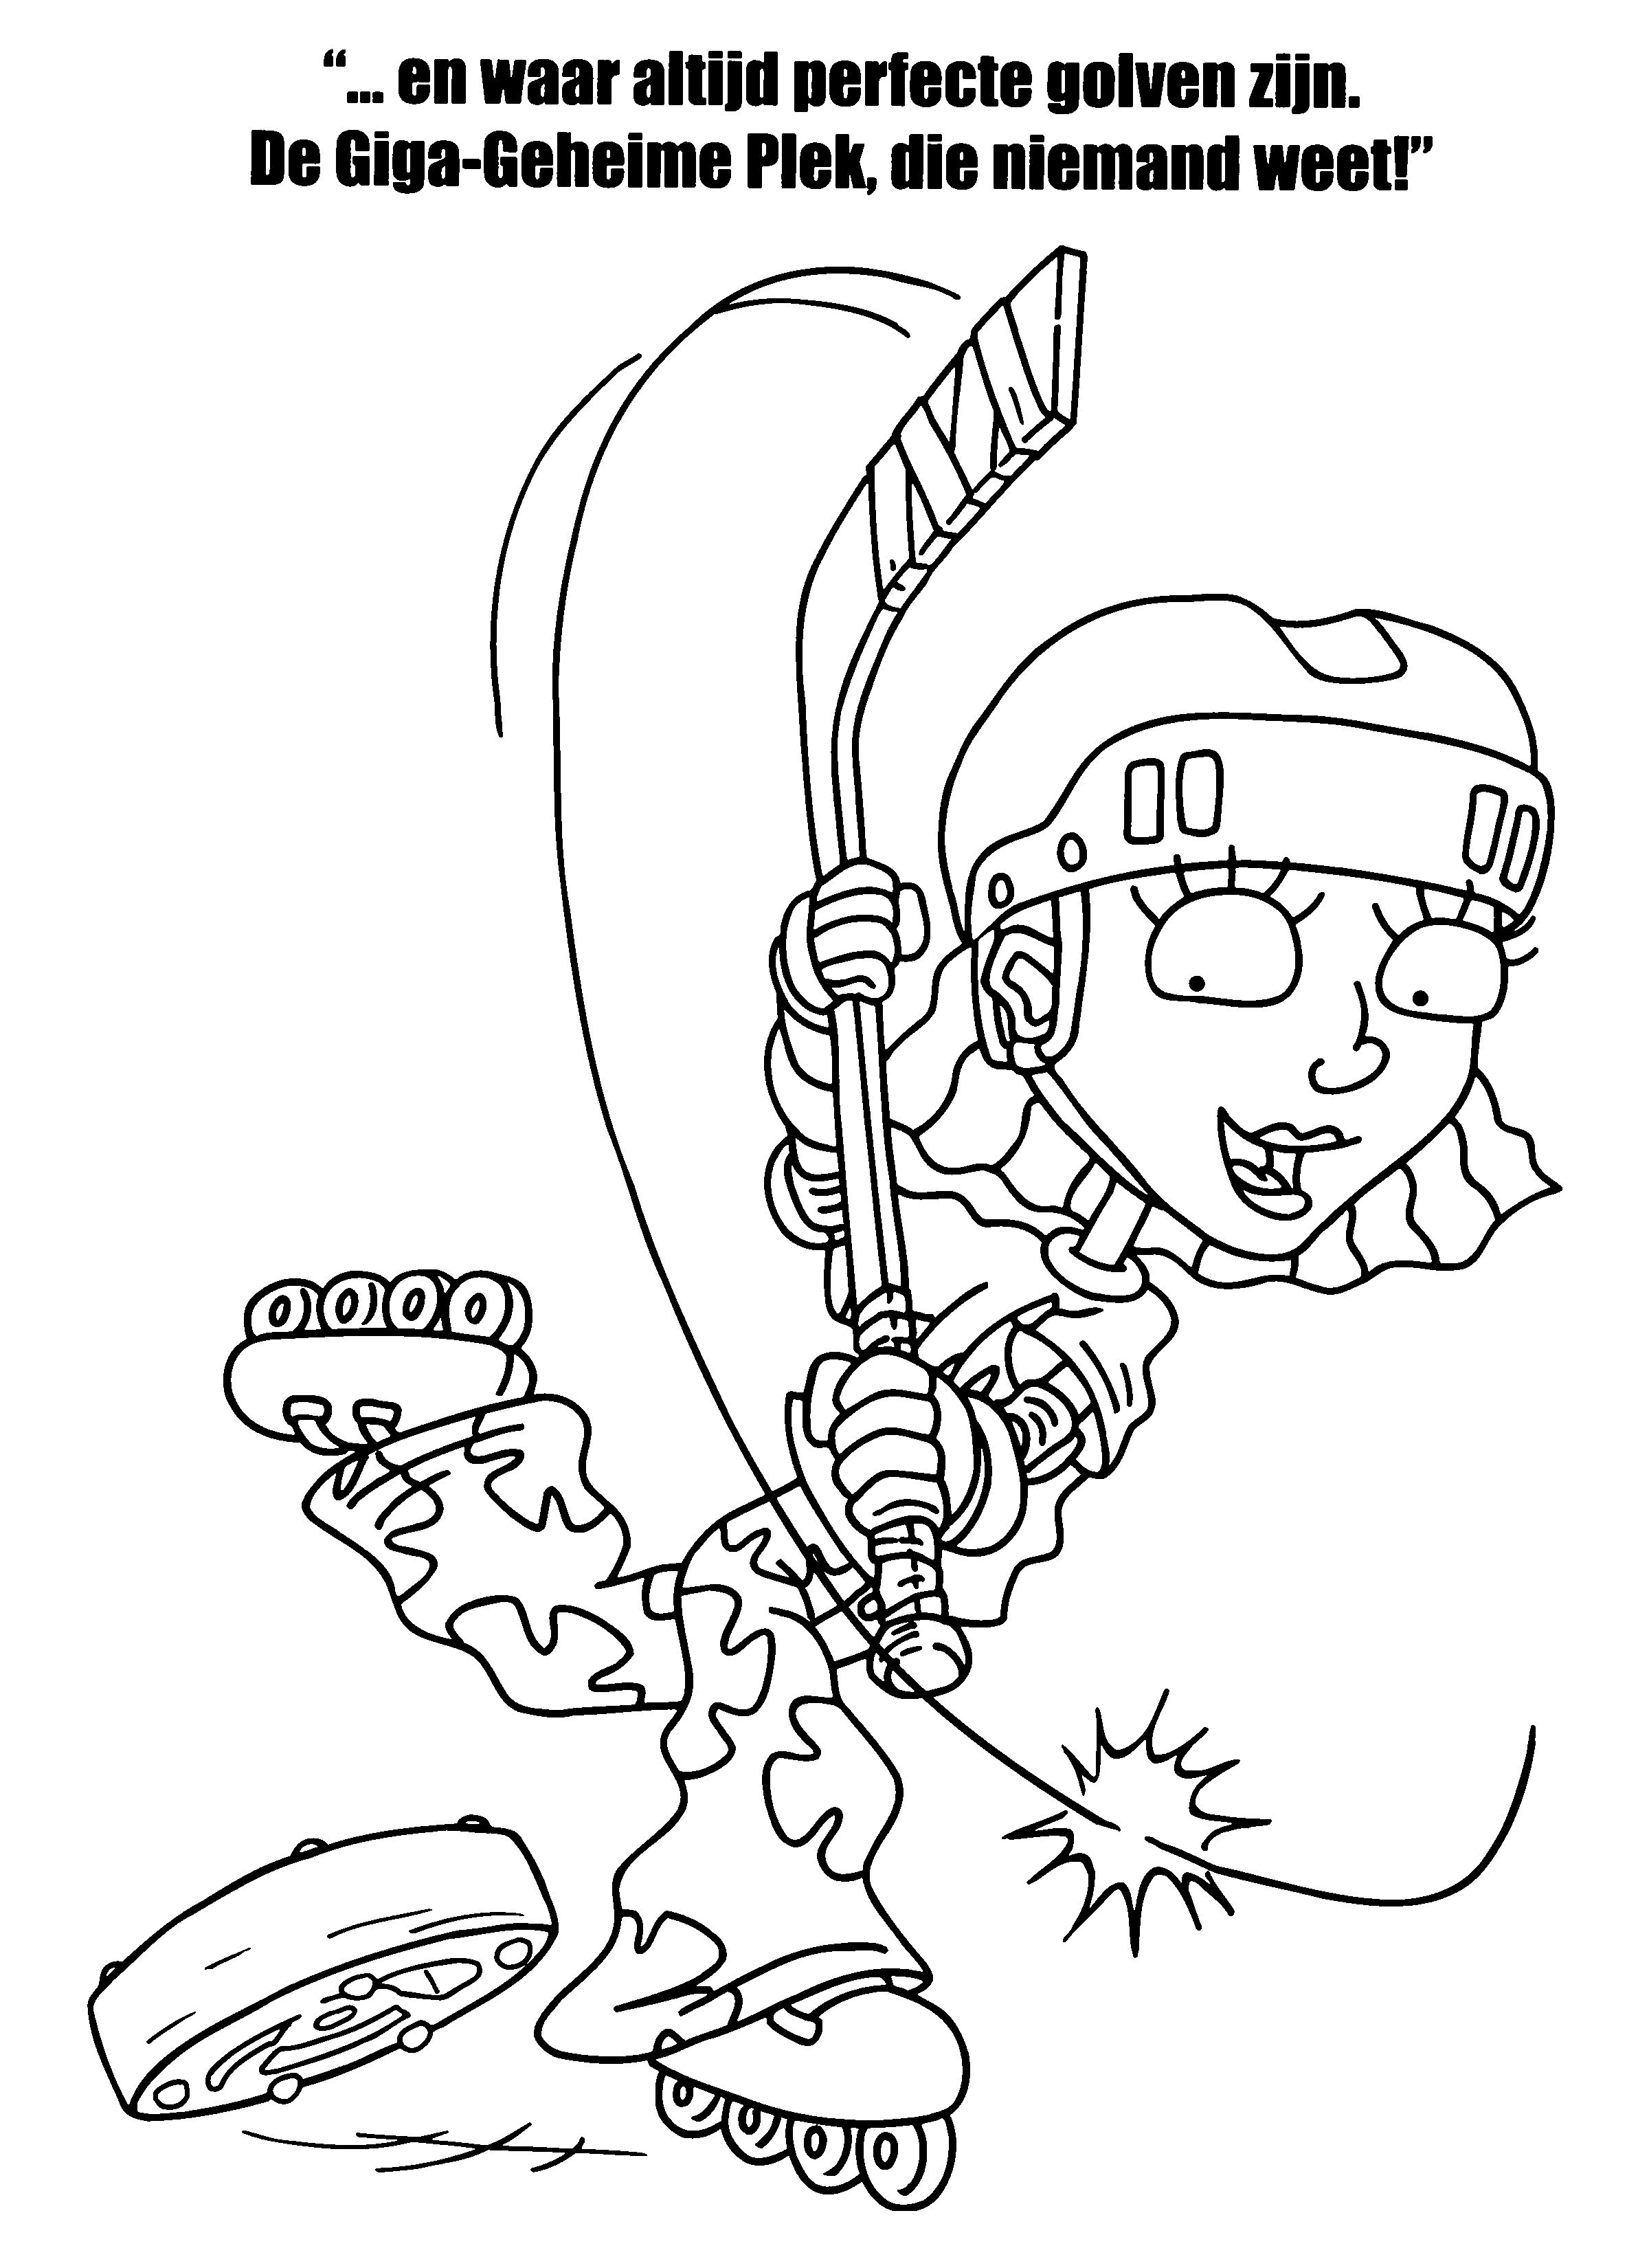 Rocket Power 17 Dibujos Faciles Para Dibujar Para Ninos Colorear Rocket Power Coloring Pages Rocket